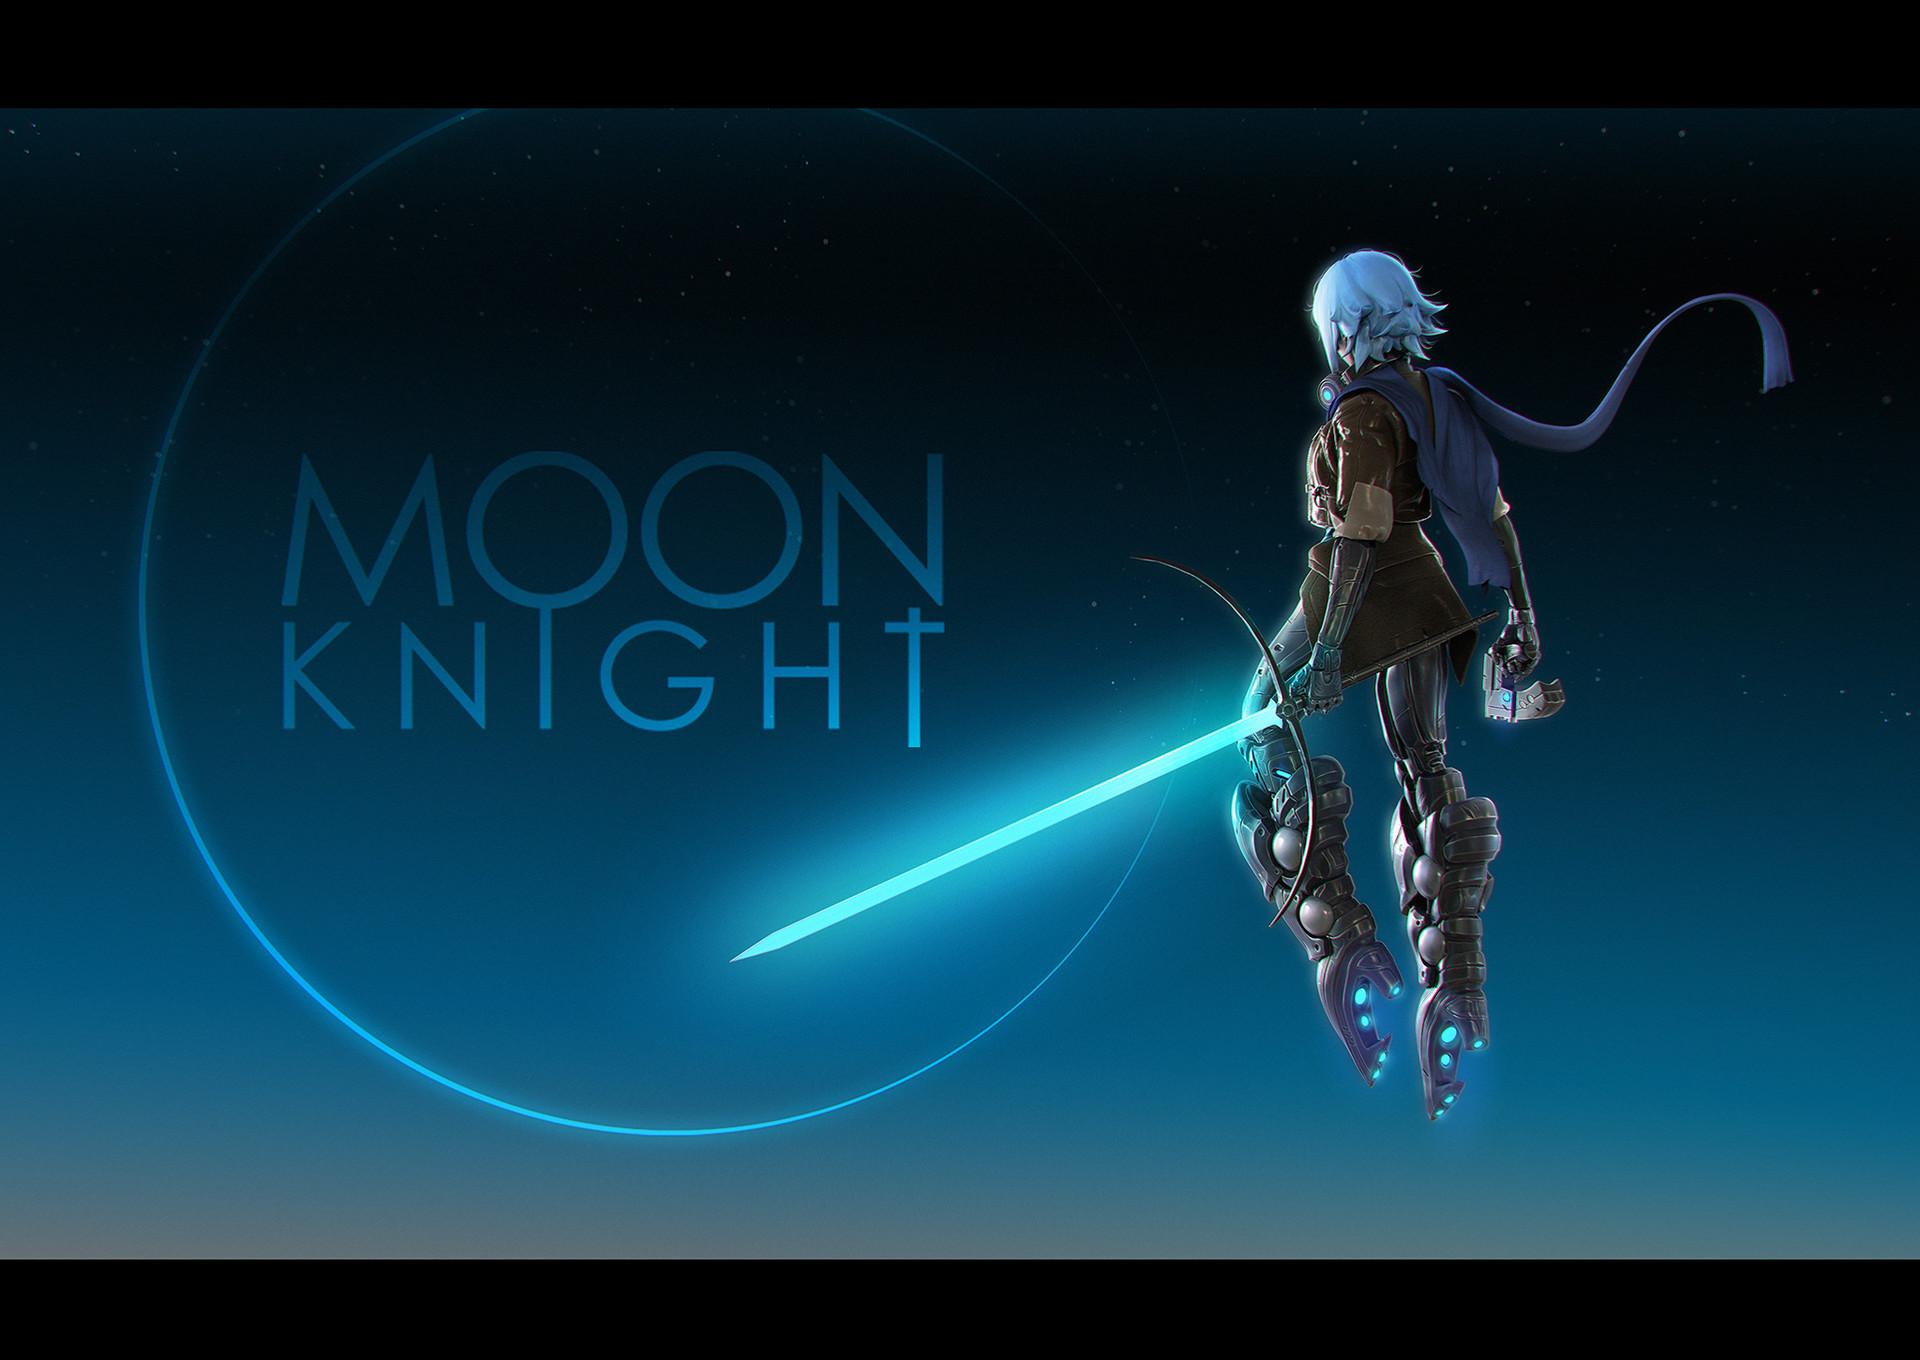 Alexandre chaudret moonknight keyshot back01 viewer